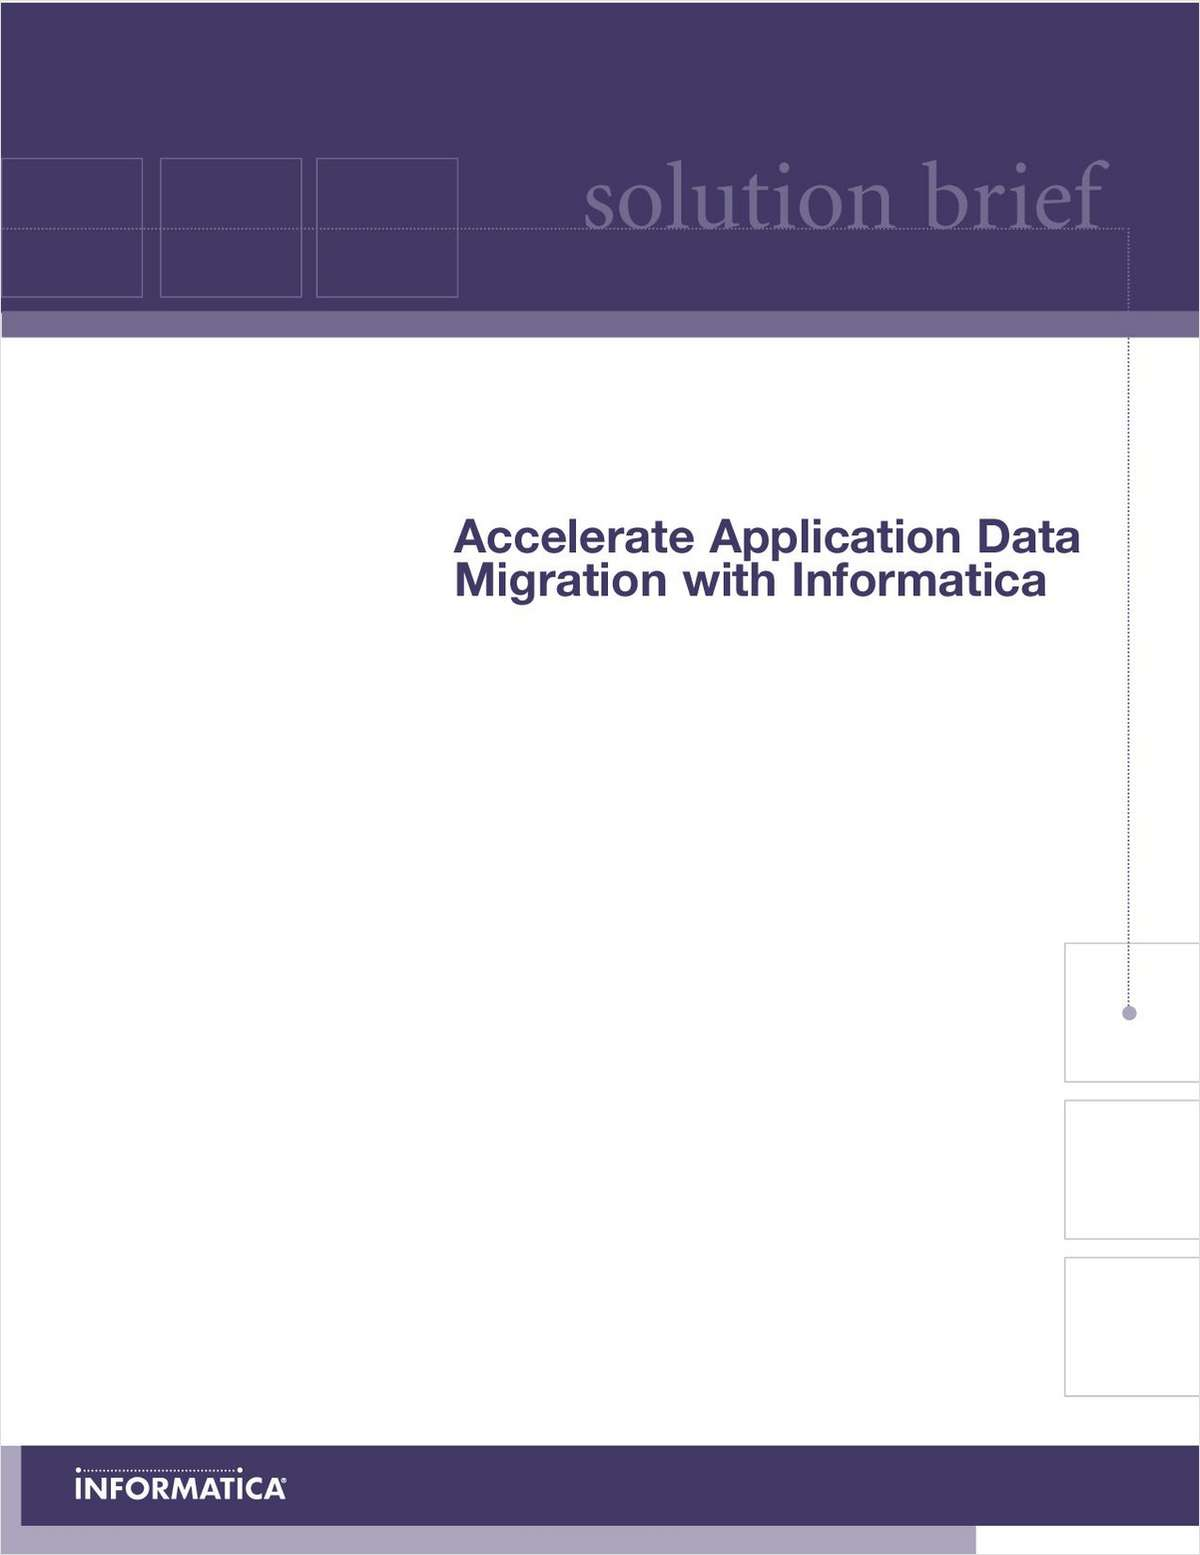 Data Migration Solution Brief